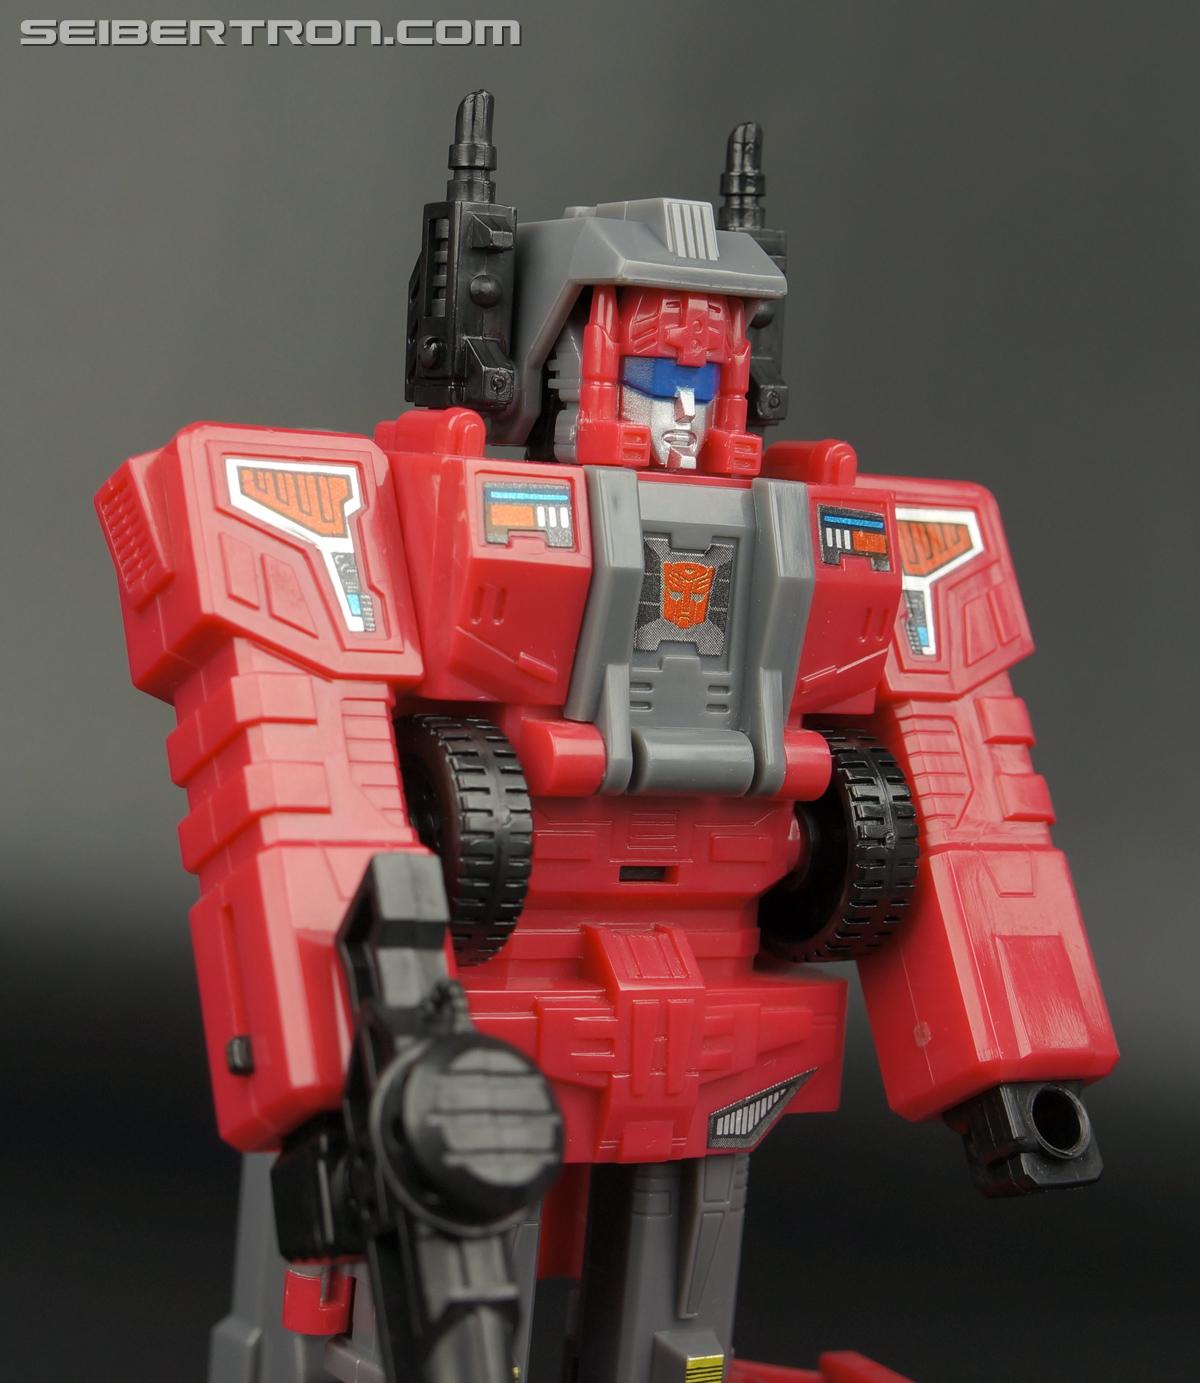 Transformers Super God Masterforce Cab (Transtector) (Image #55 of 111)